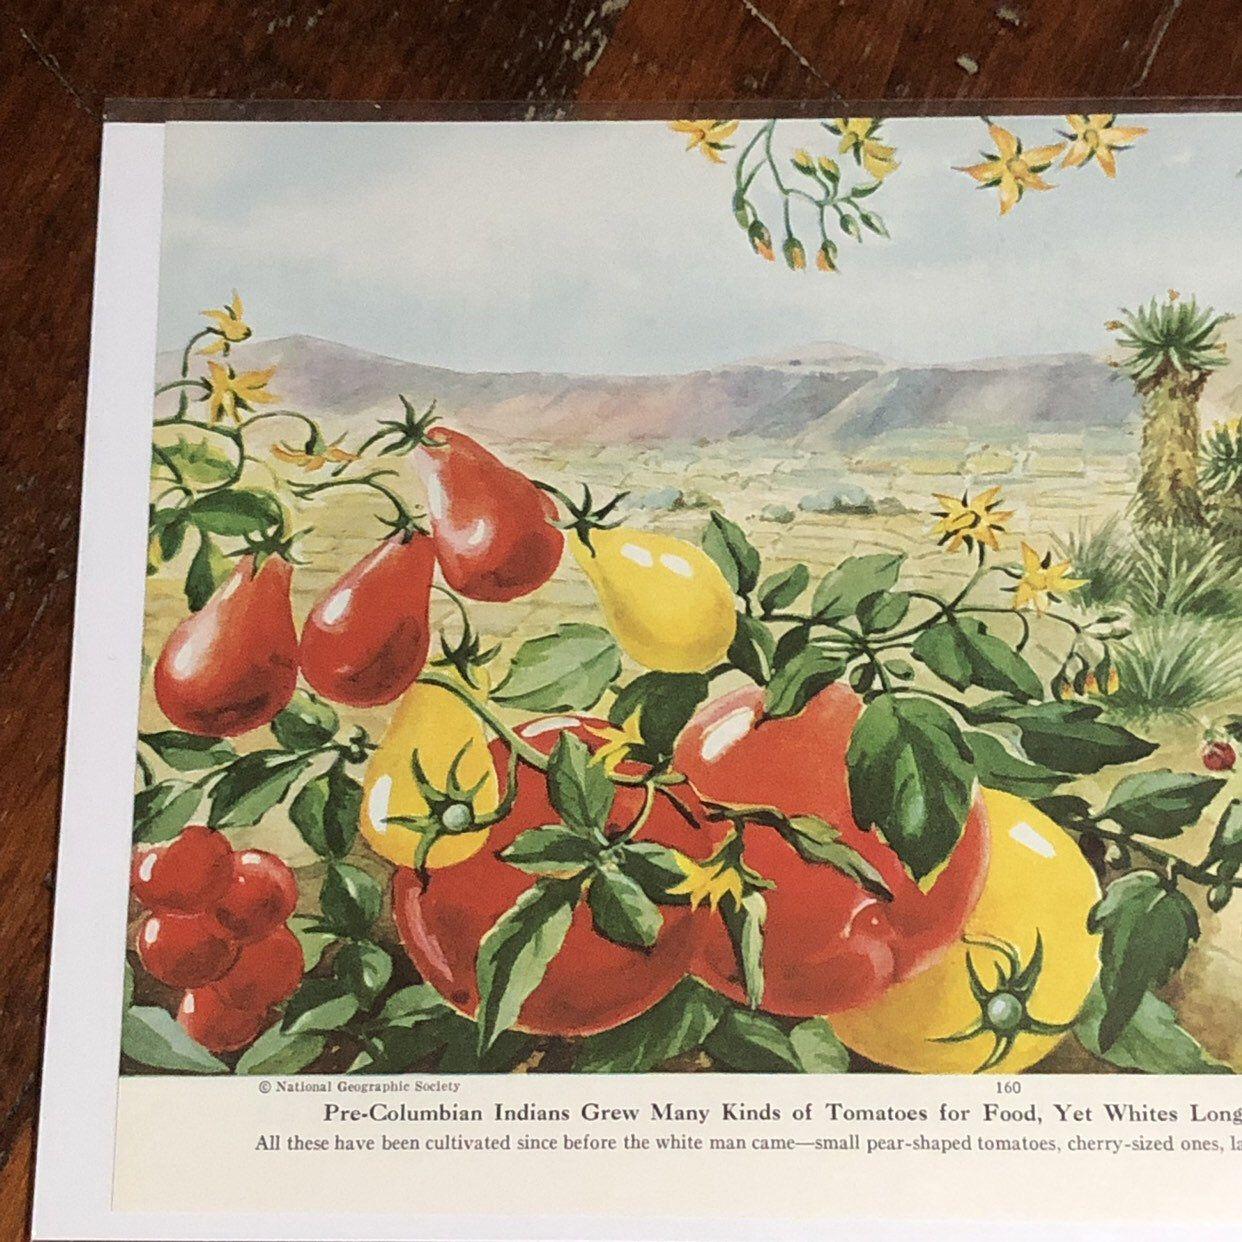 bd1dc97189252 COLORFUL VEGETABLE Prints, Vintage Ephemera, 1935 National ...